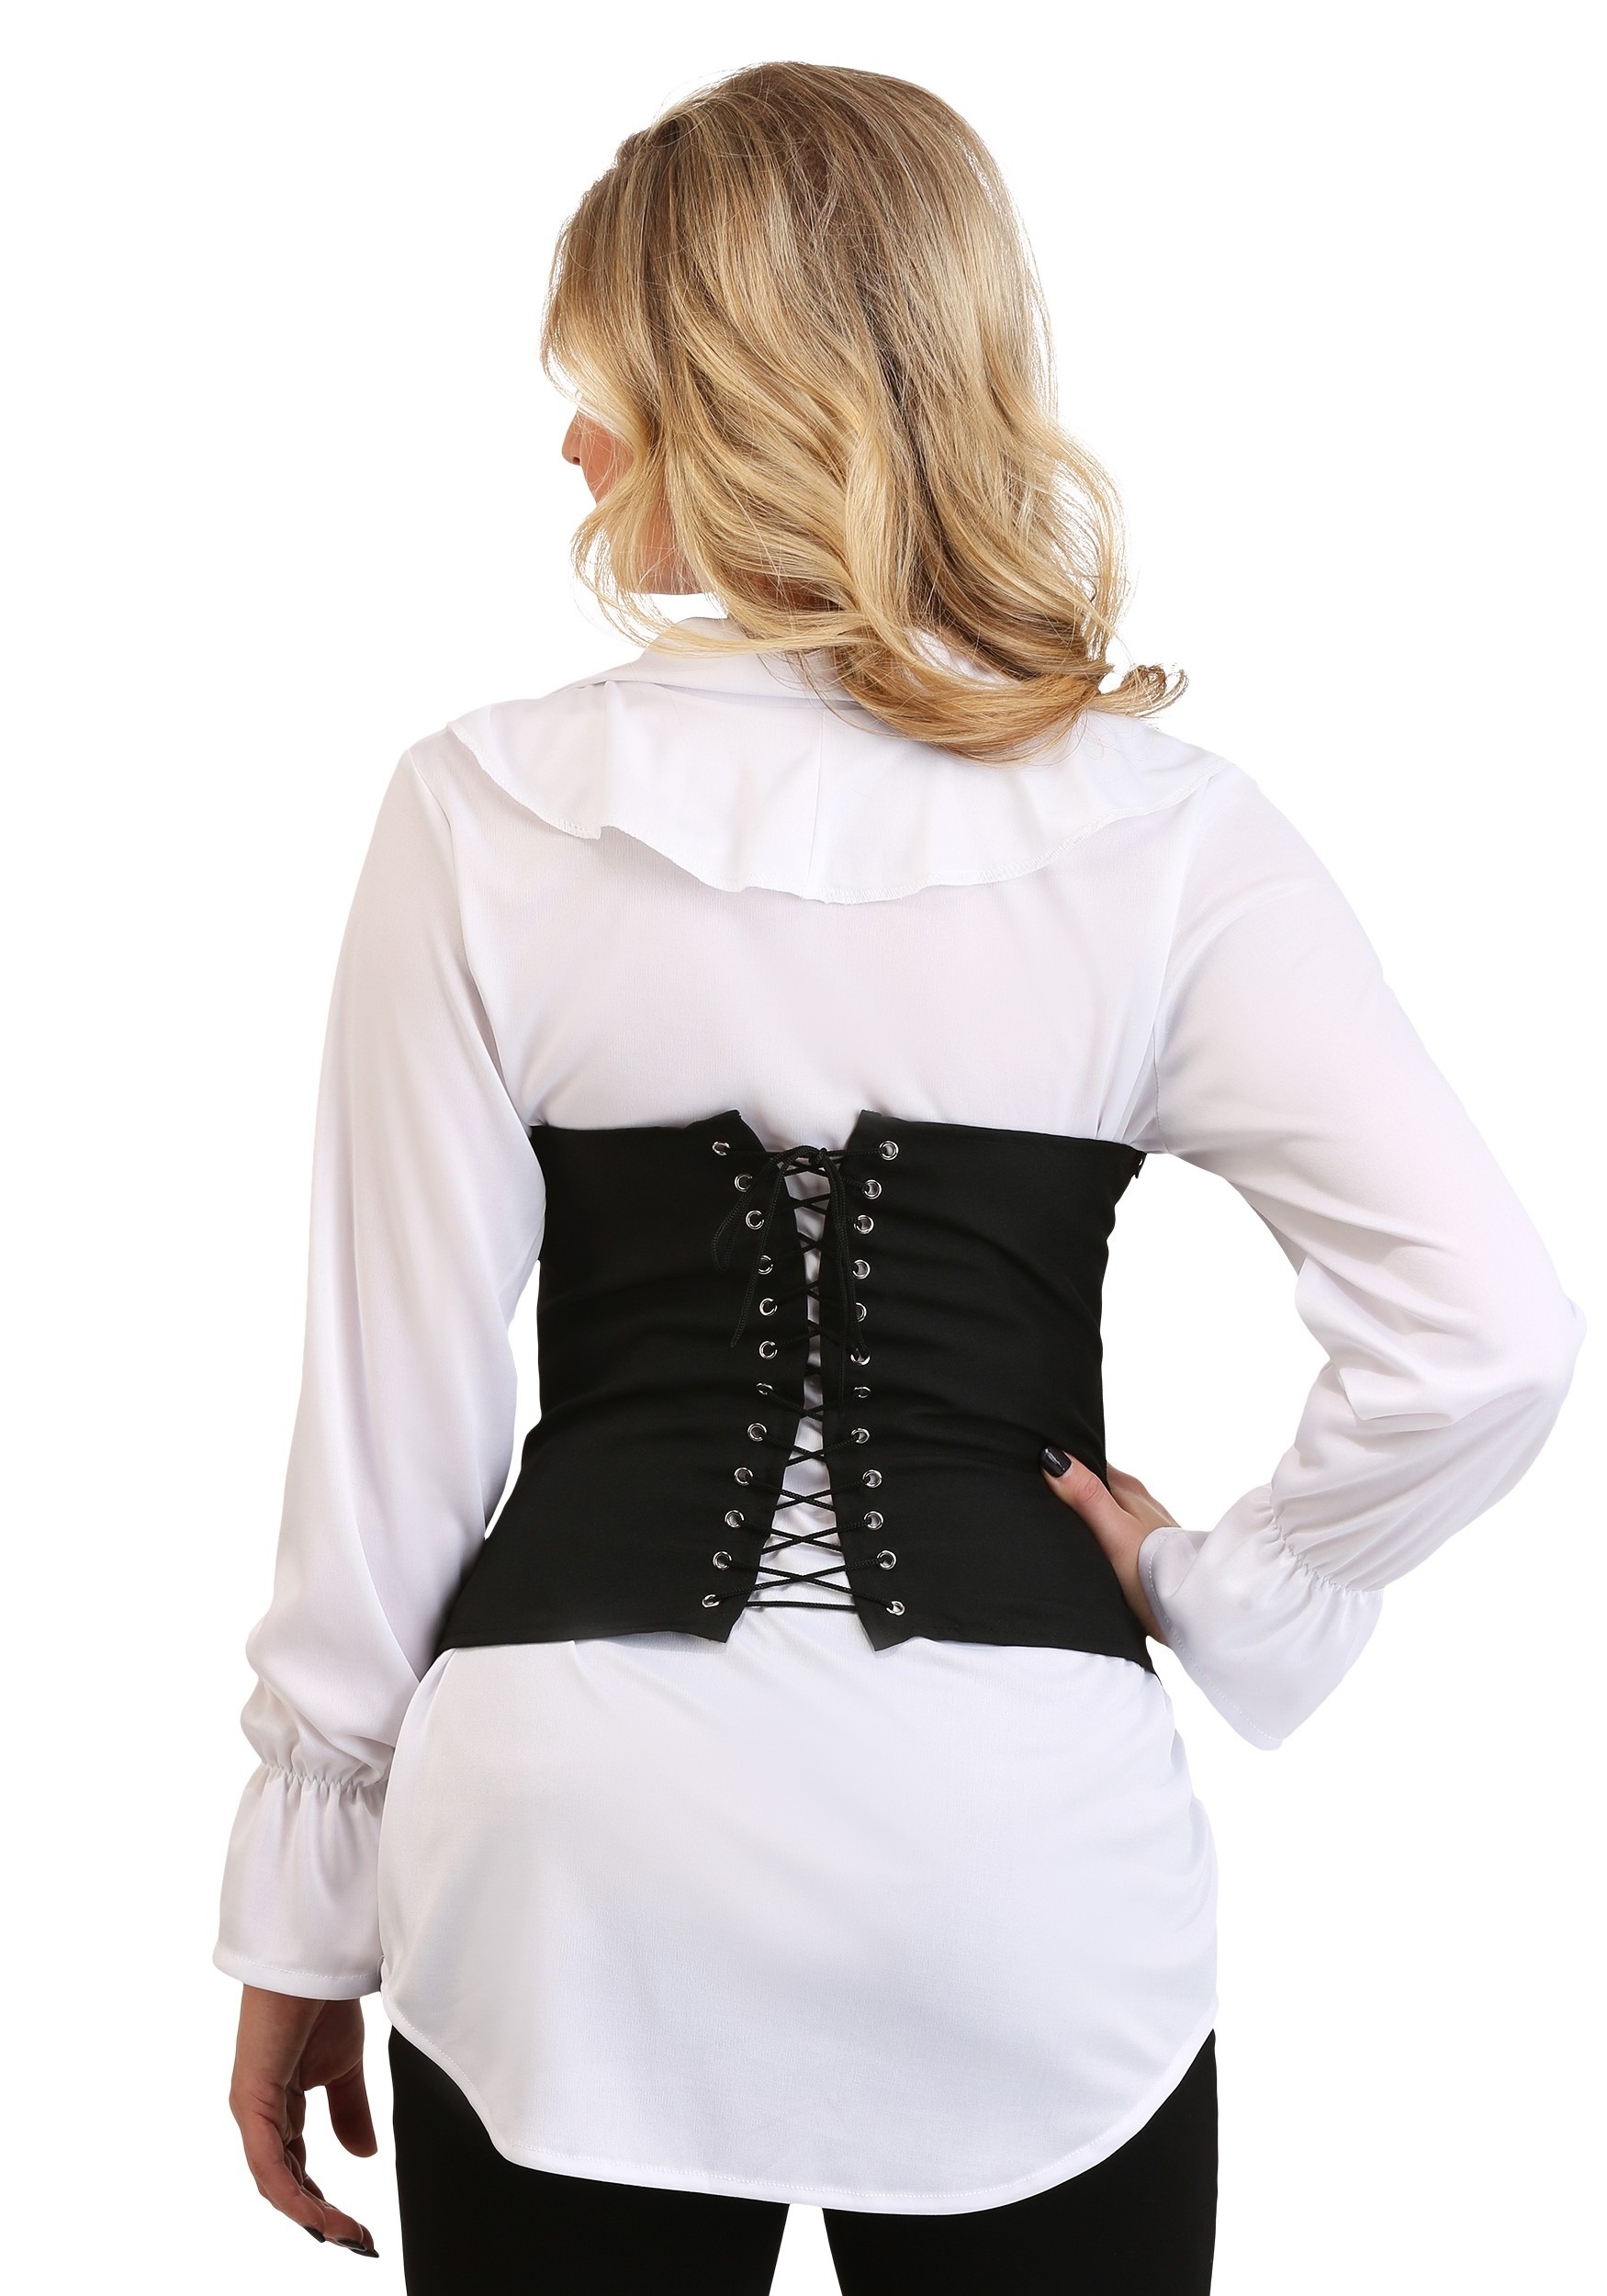 049c087a482f99 ... Plus Size Women's Ruffled Pirate Costume Blouse Alt1